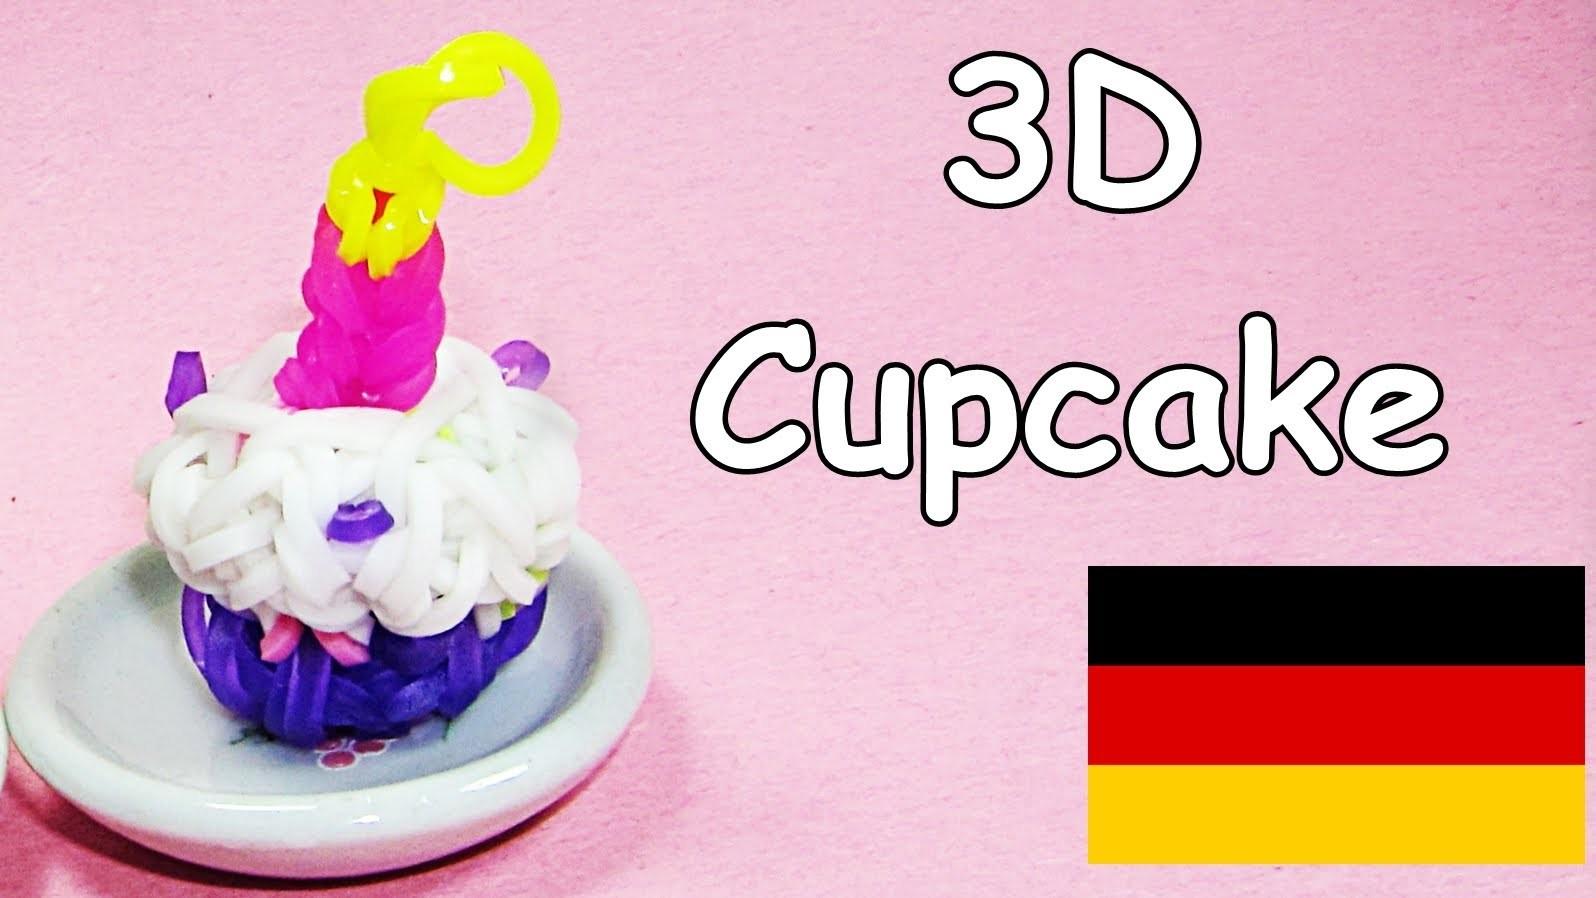 Loom Bandz Anleitung Deutsch Cupcake (Rainbow Loom Deutsch Loom Bands 3D)